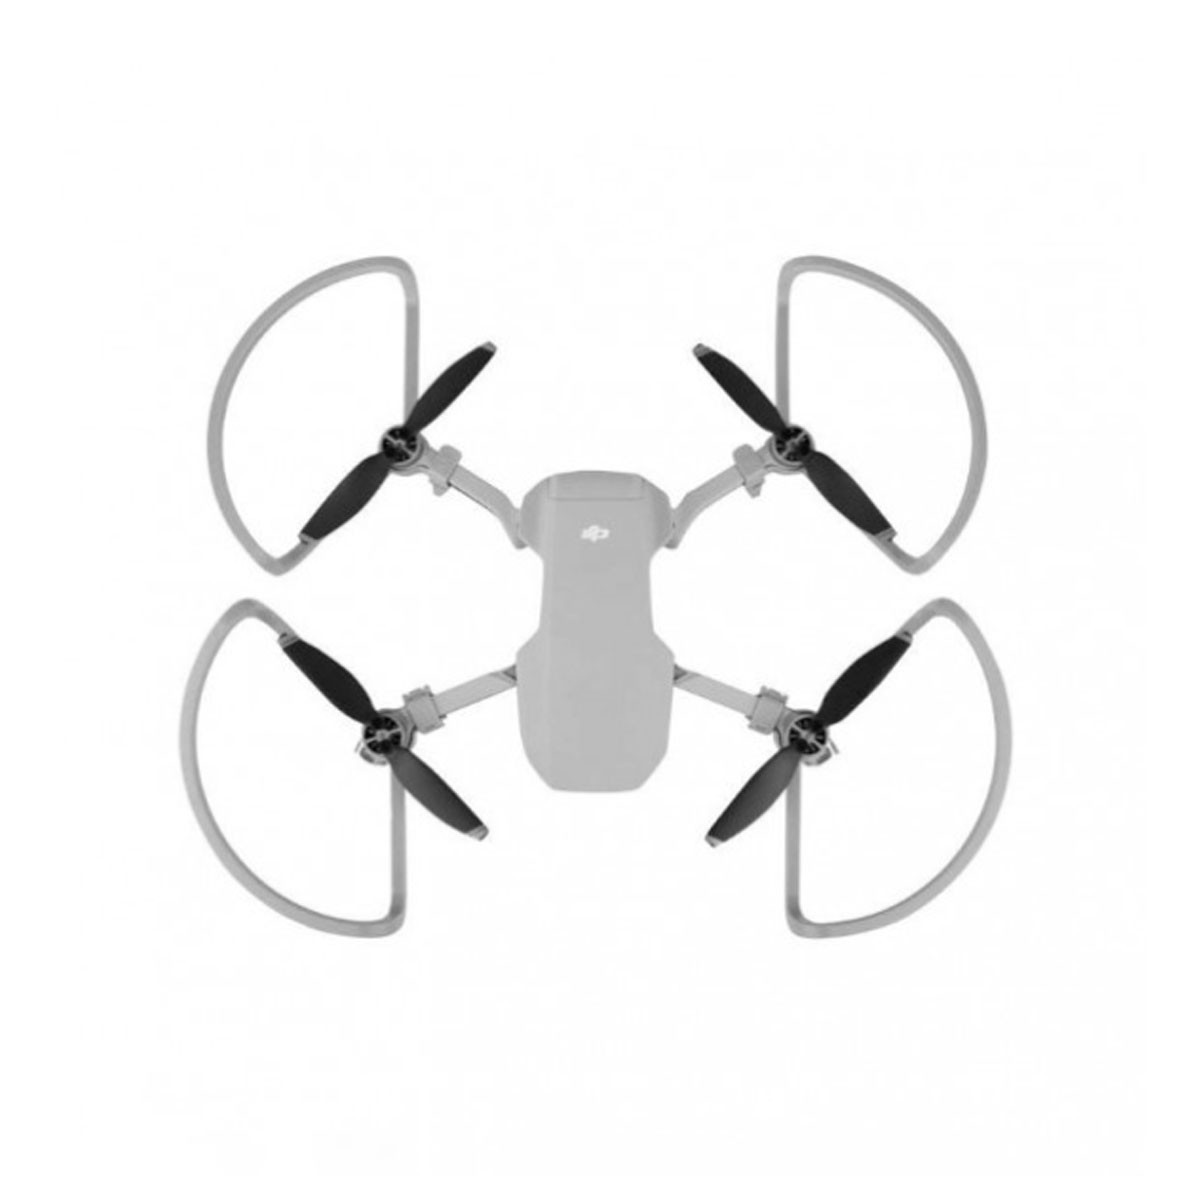 Protetor de Hélices com Trem de Pouso - Drone DJI Mavic Mini